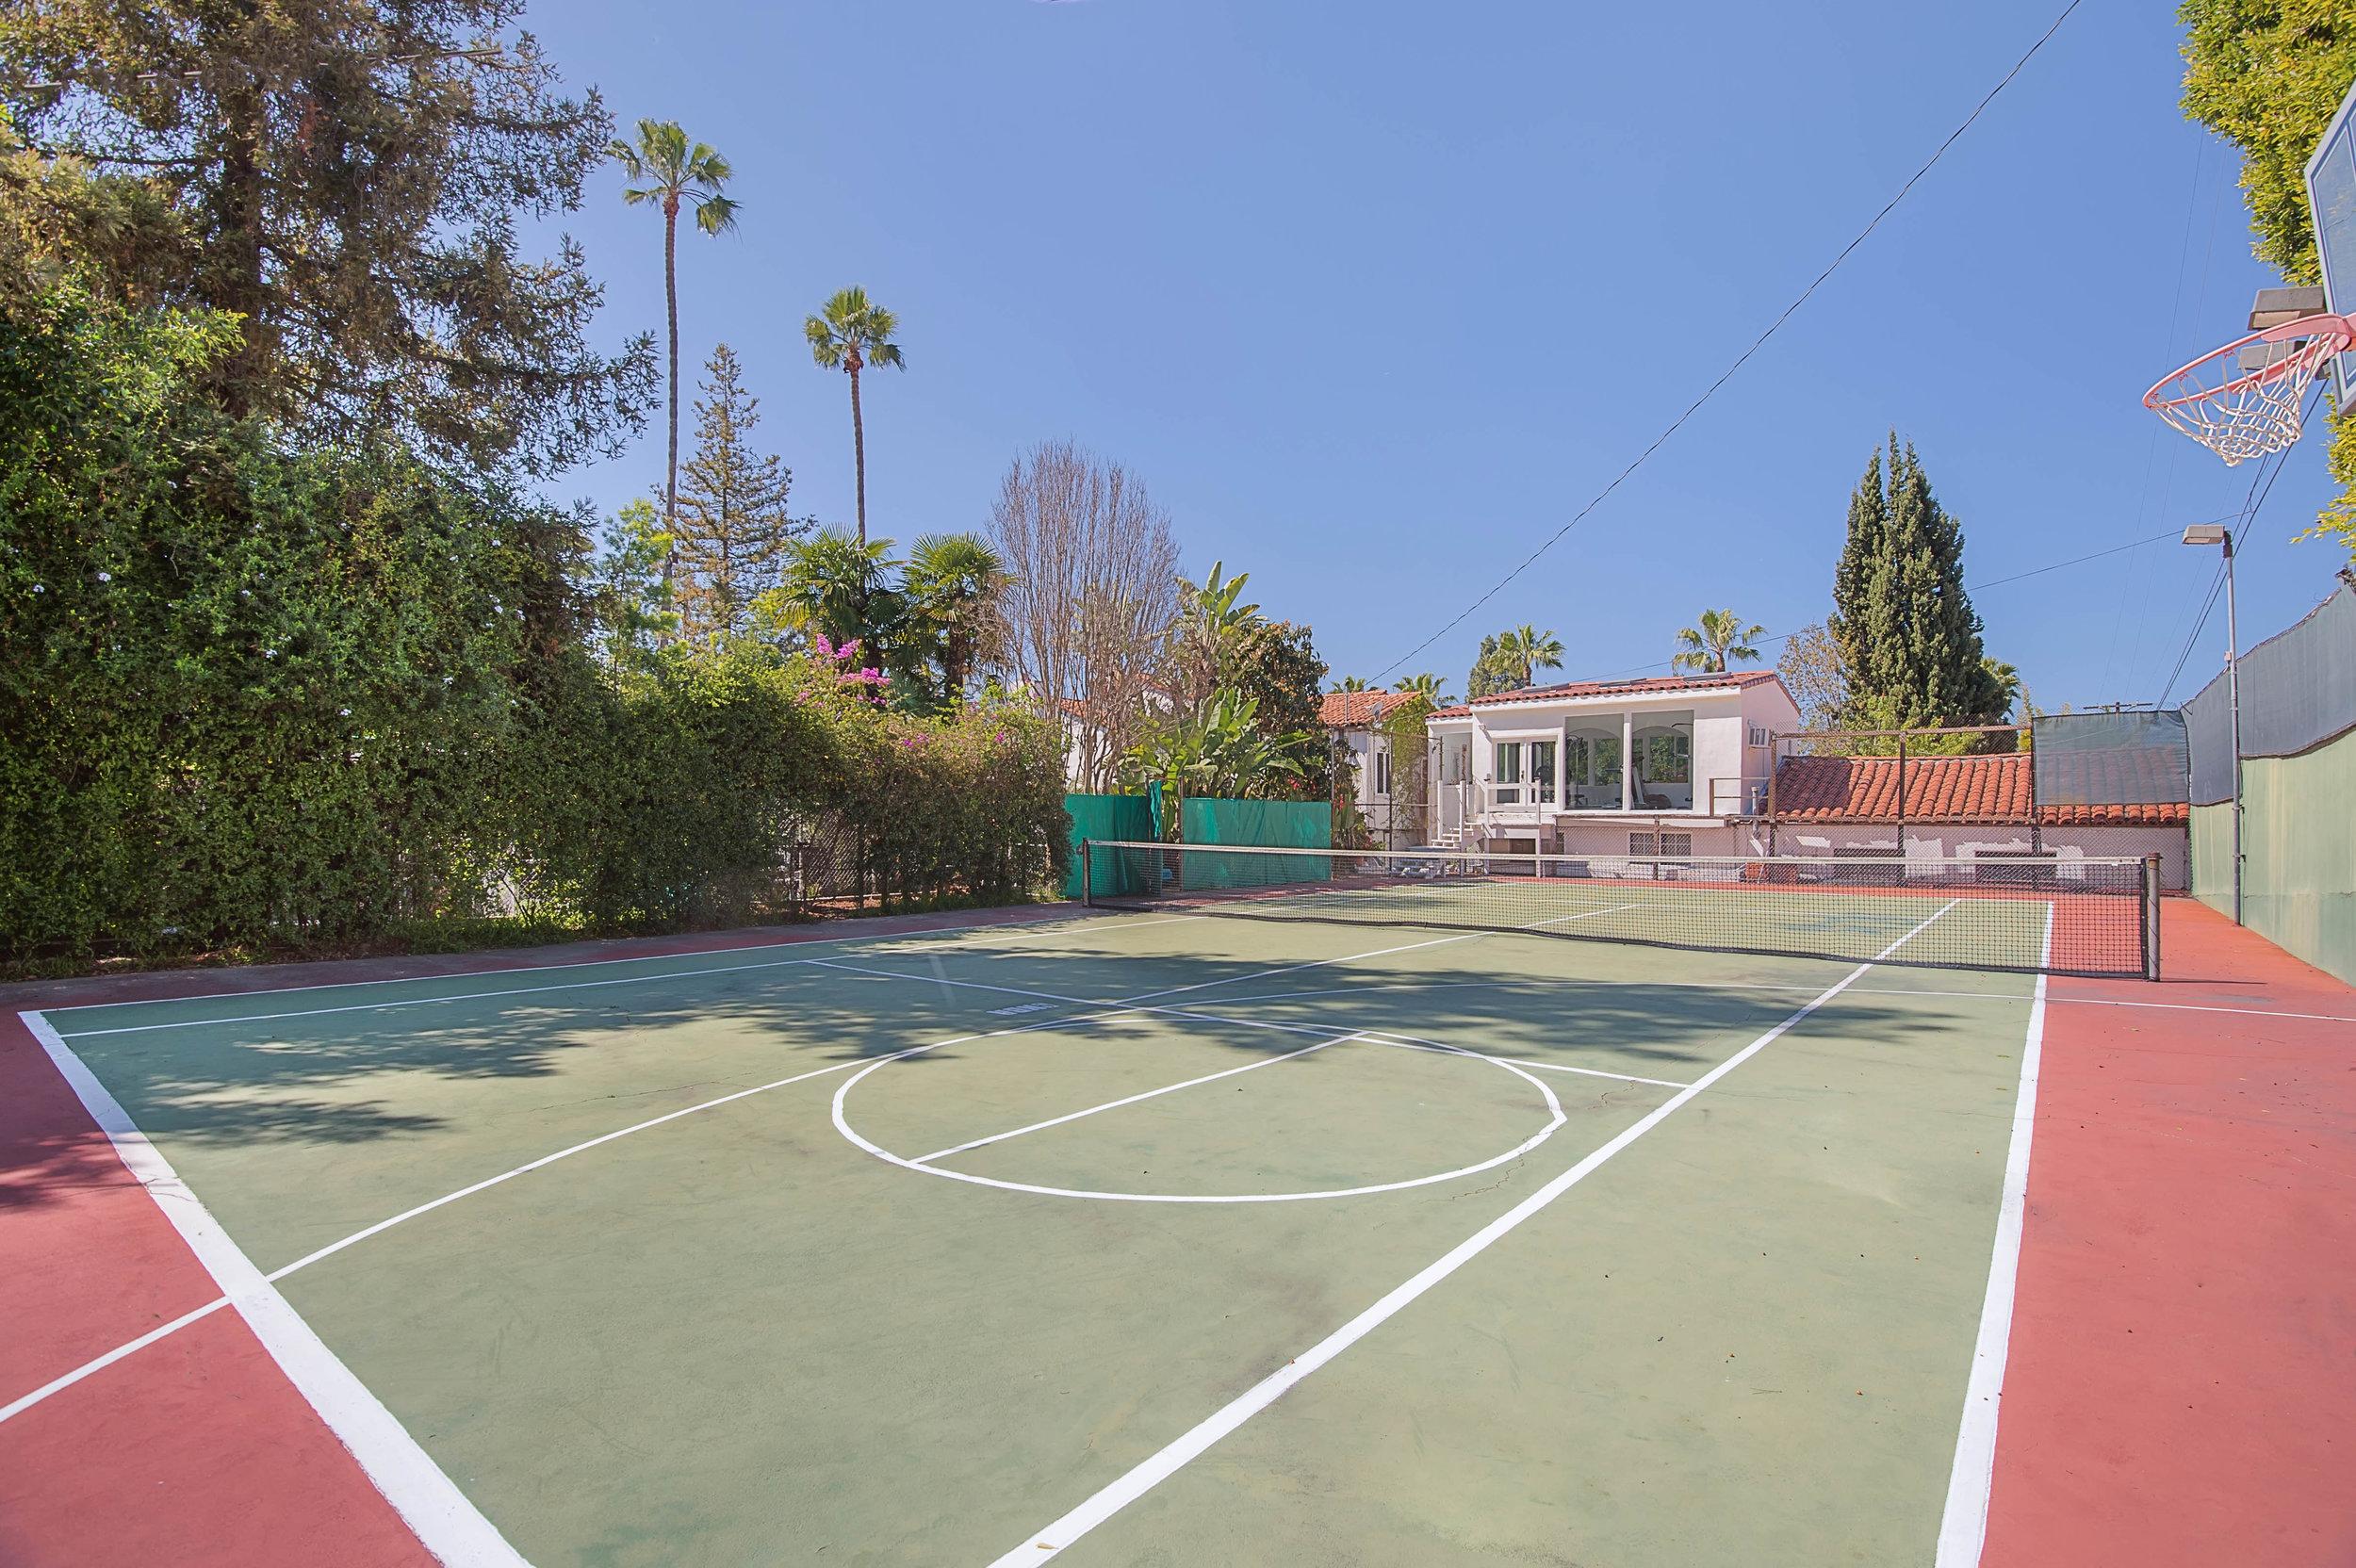 028 Tennis Court 006 Pool 4915 Los Feliz For Sale Los Angeles Lease The Malibu Life Team Luxury Real Estate.jpg